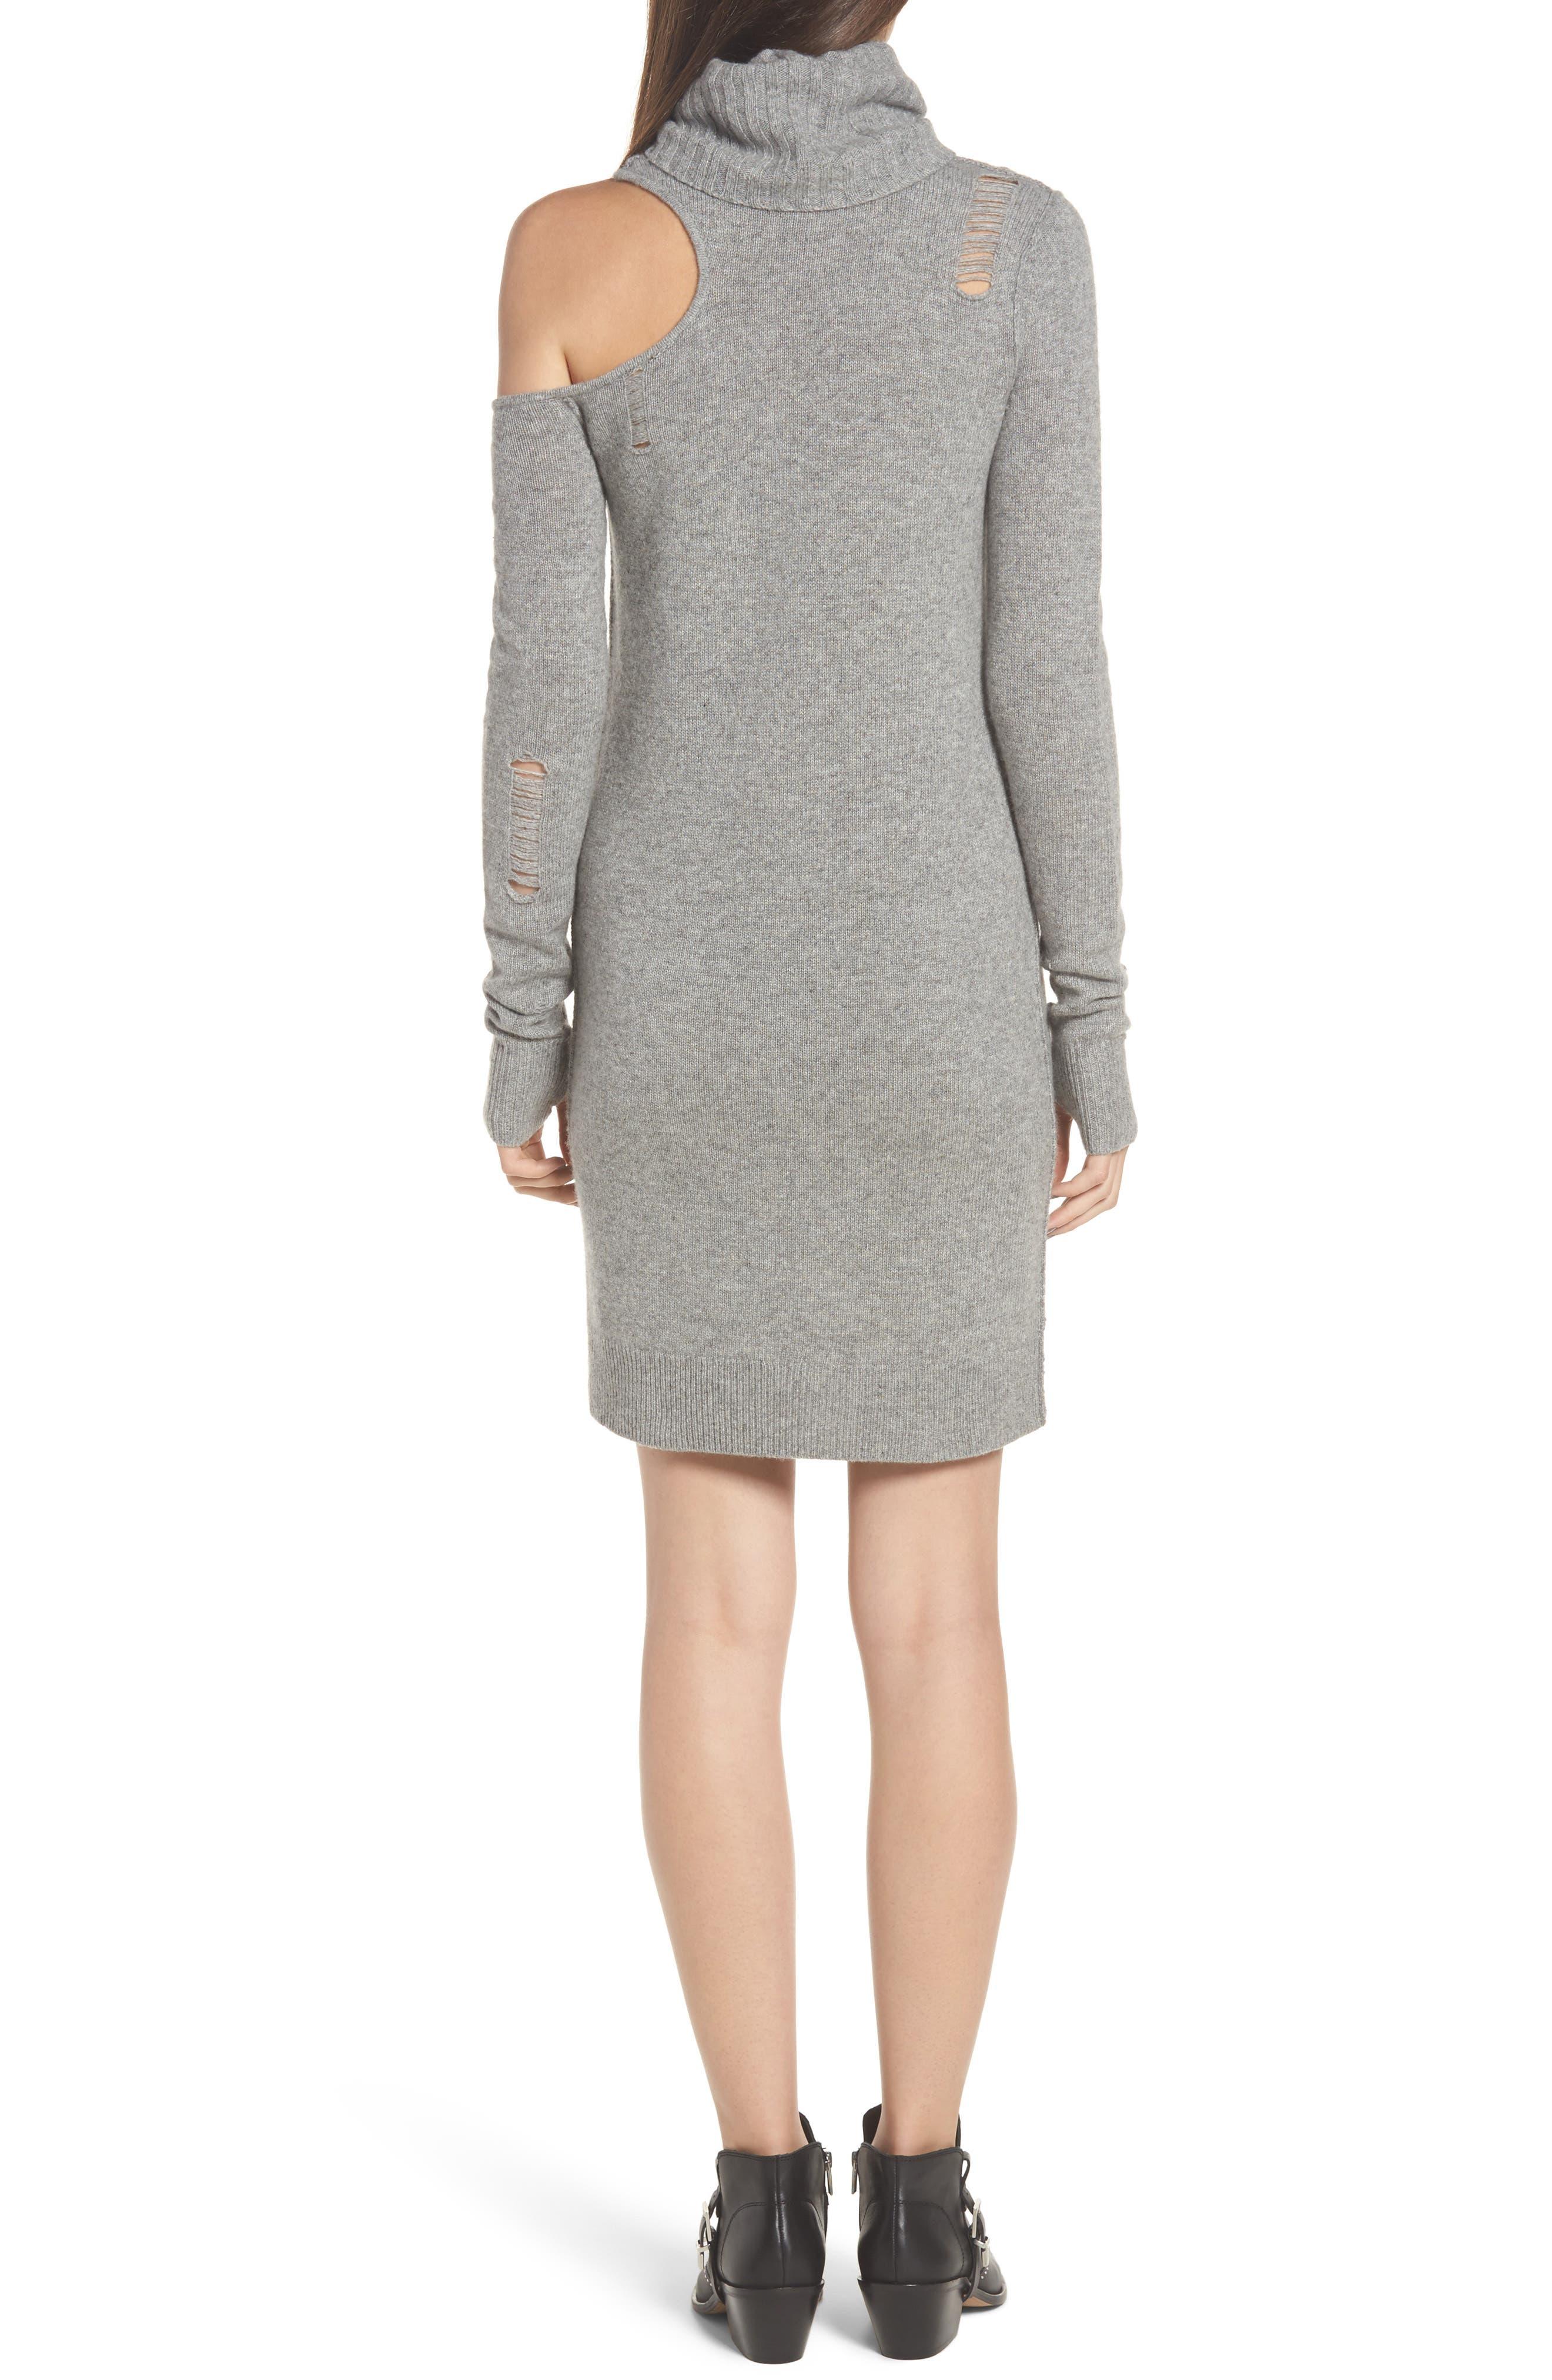 Destroyed Turtleneck Sweater Dress,                             Alternate thumbnail 2, color,                             Heather Grey